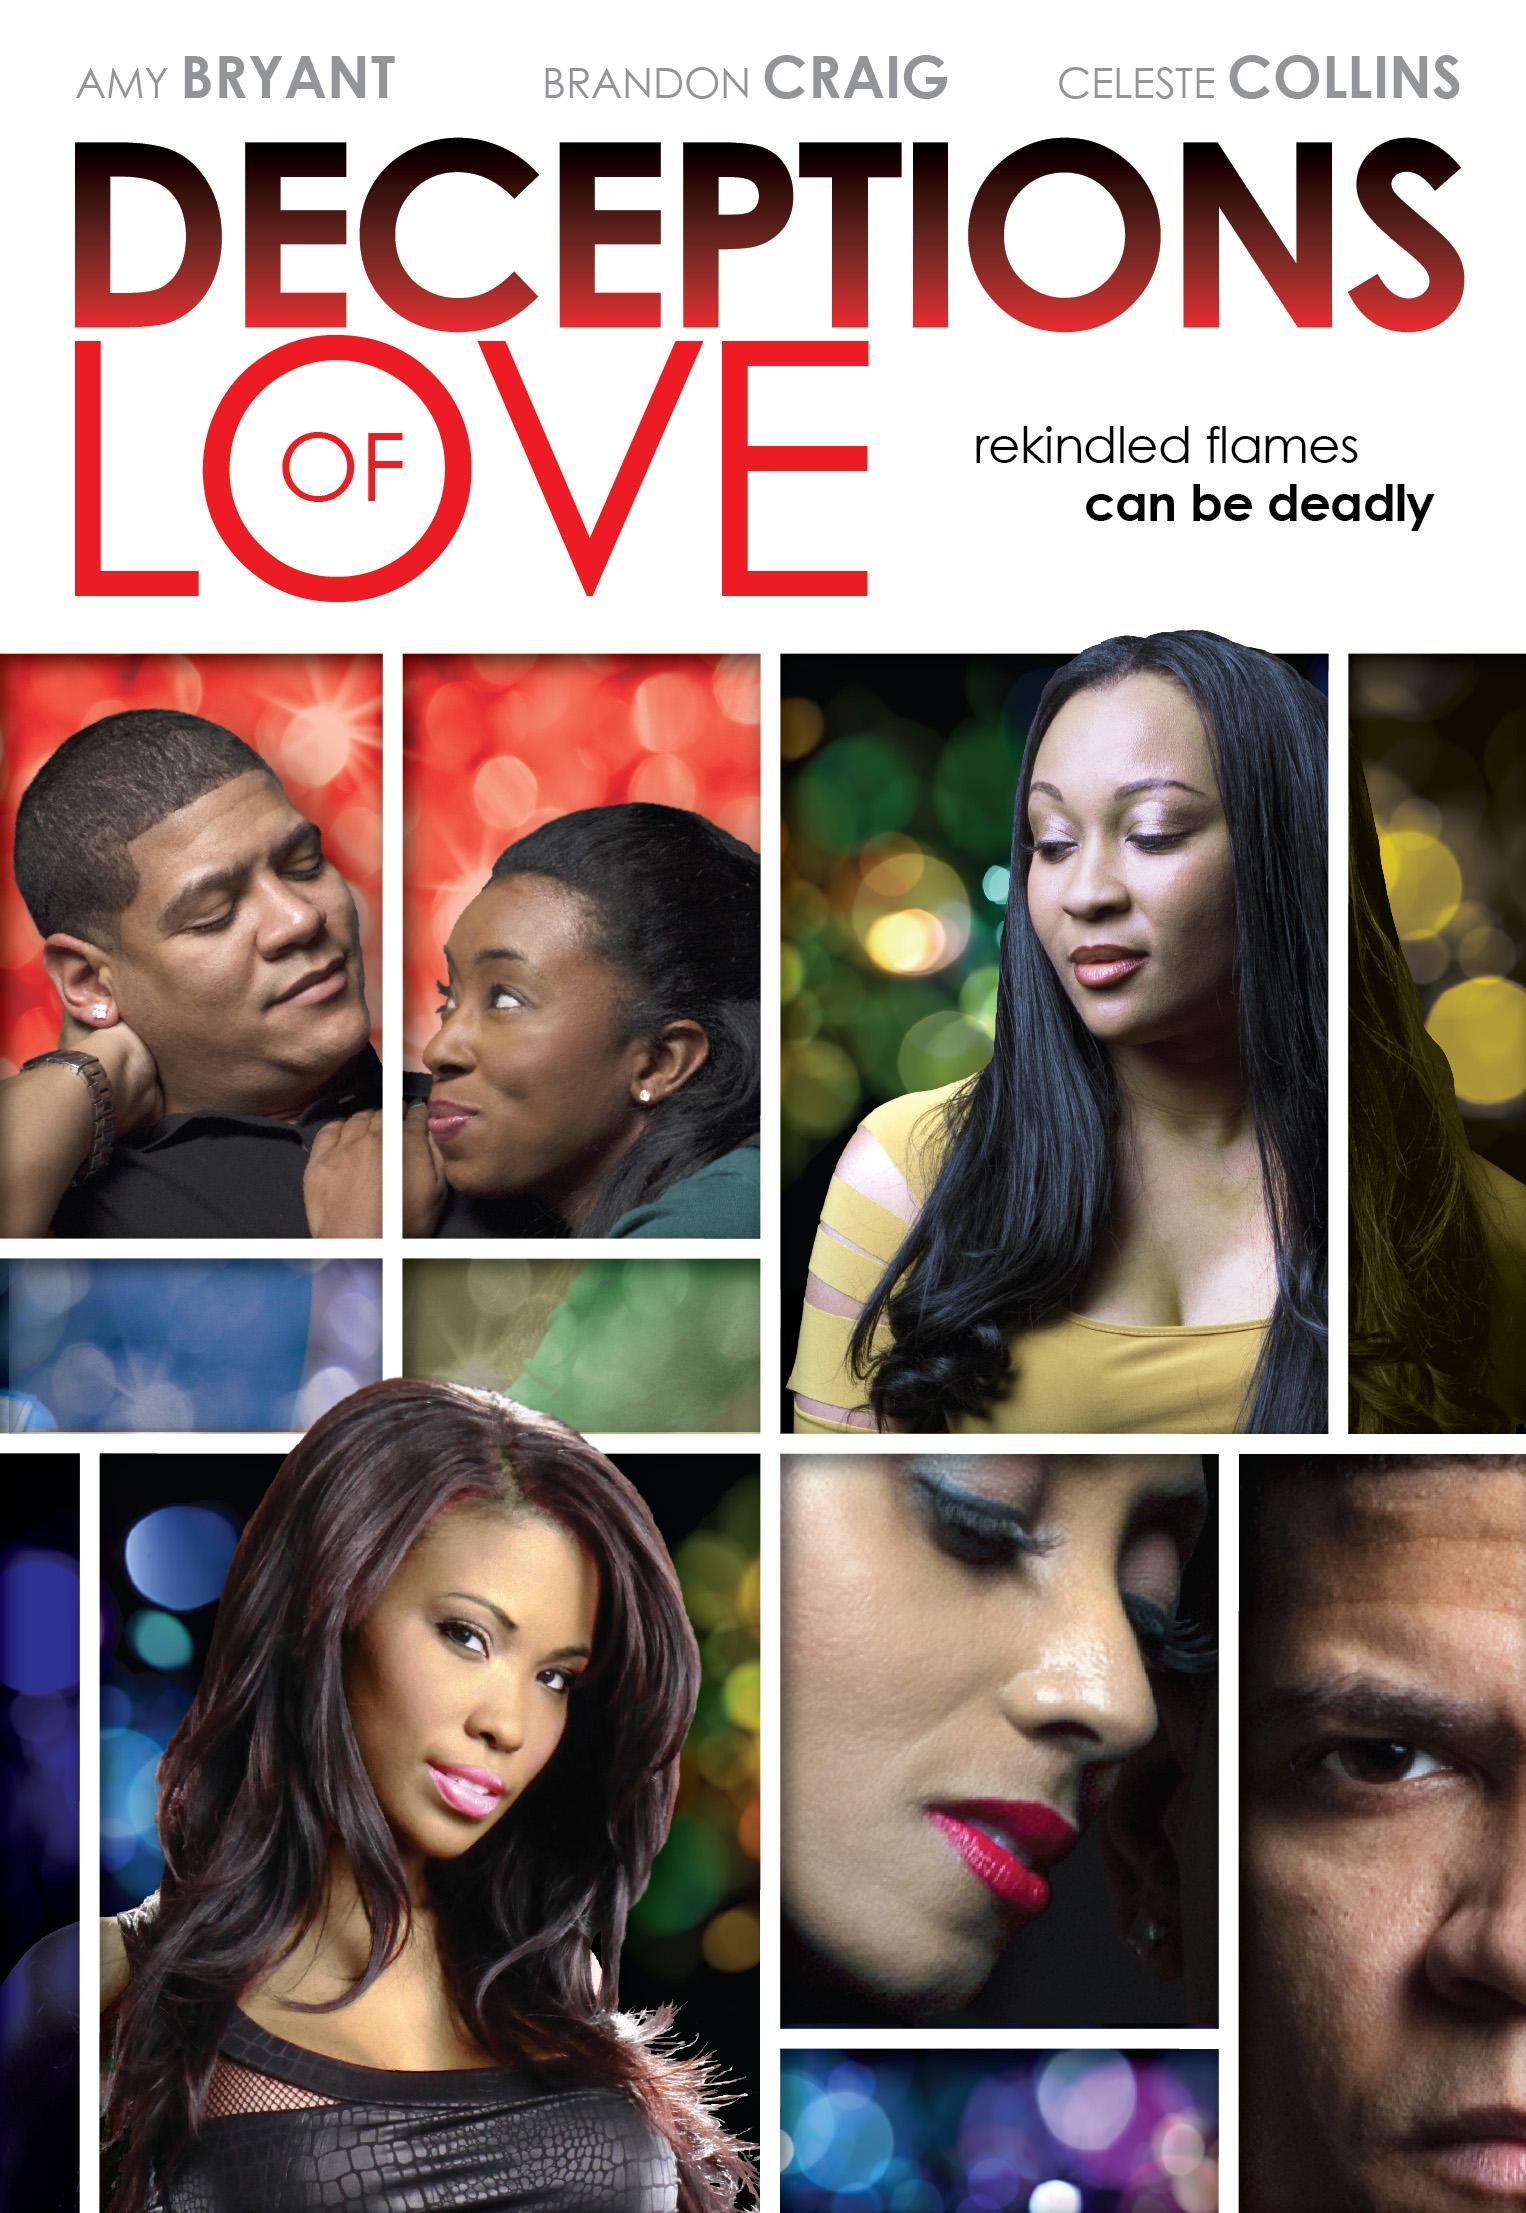 Deceptions of Love